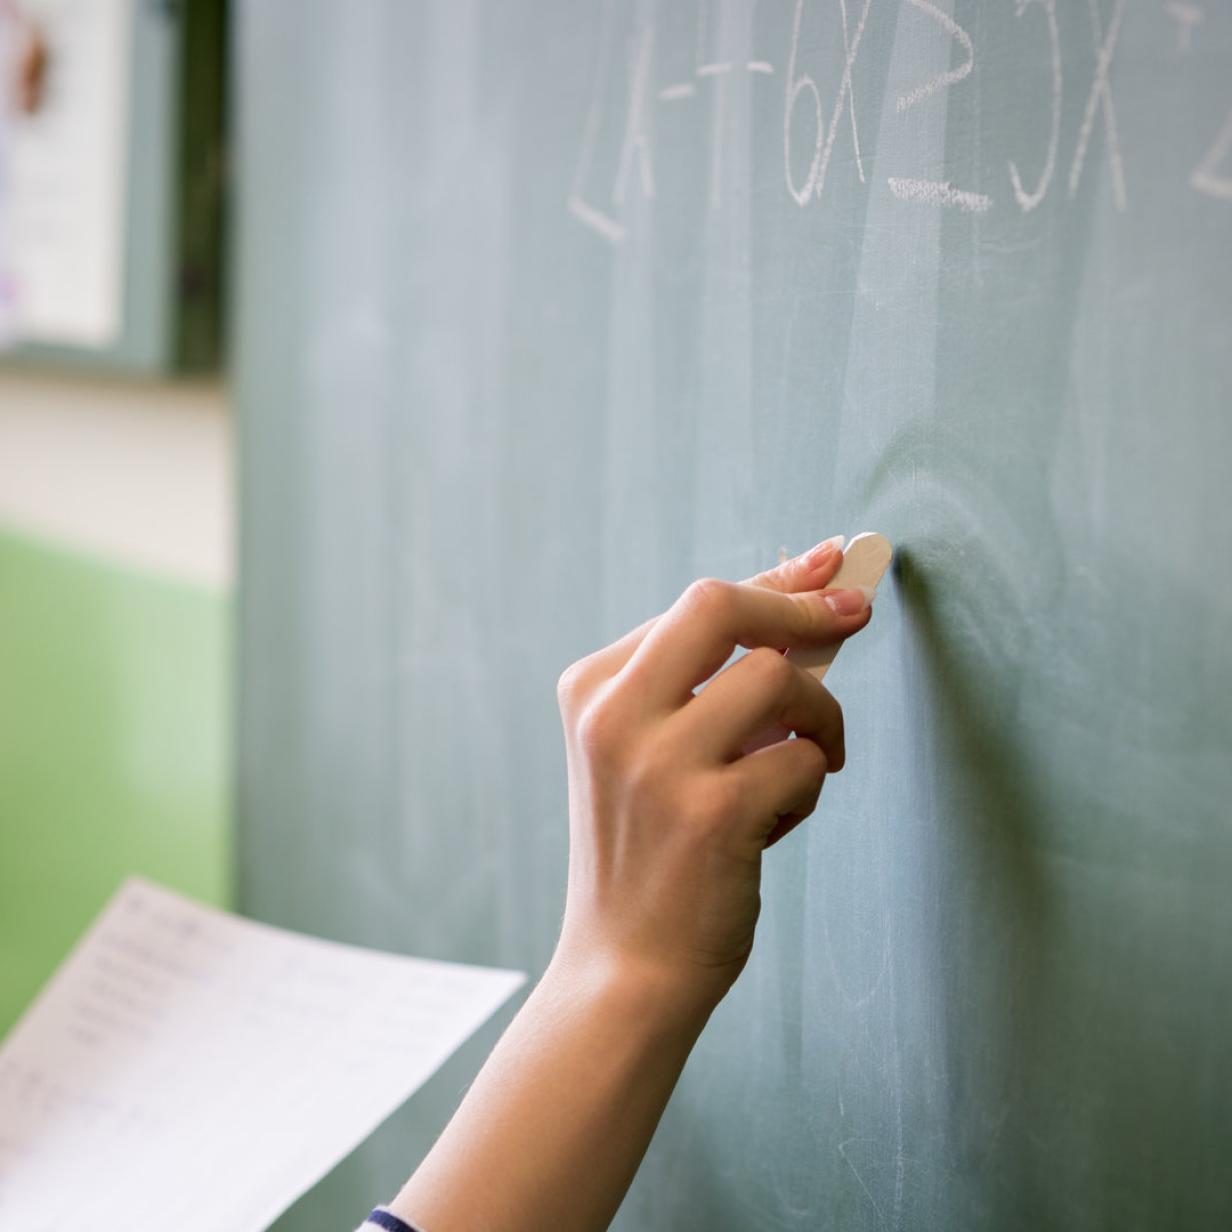 San Francisco: Krebskranke Lehrerin muss Vertretungskraft bezahlen